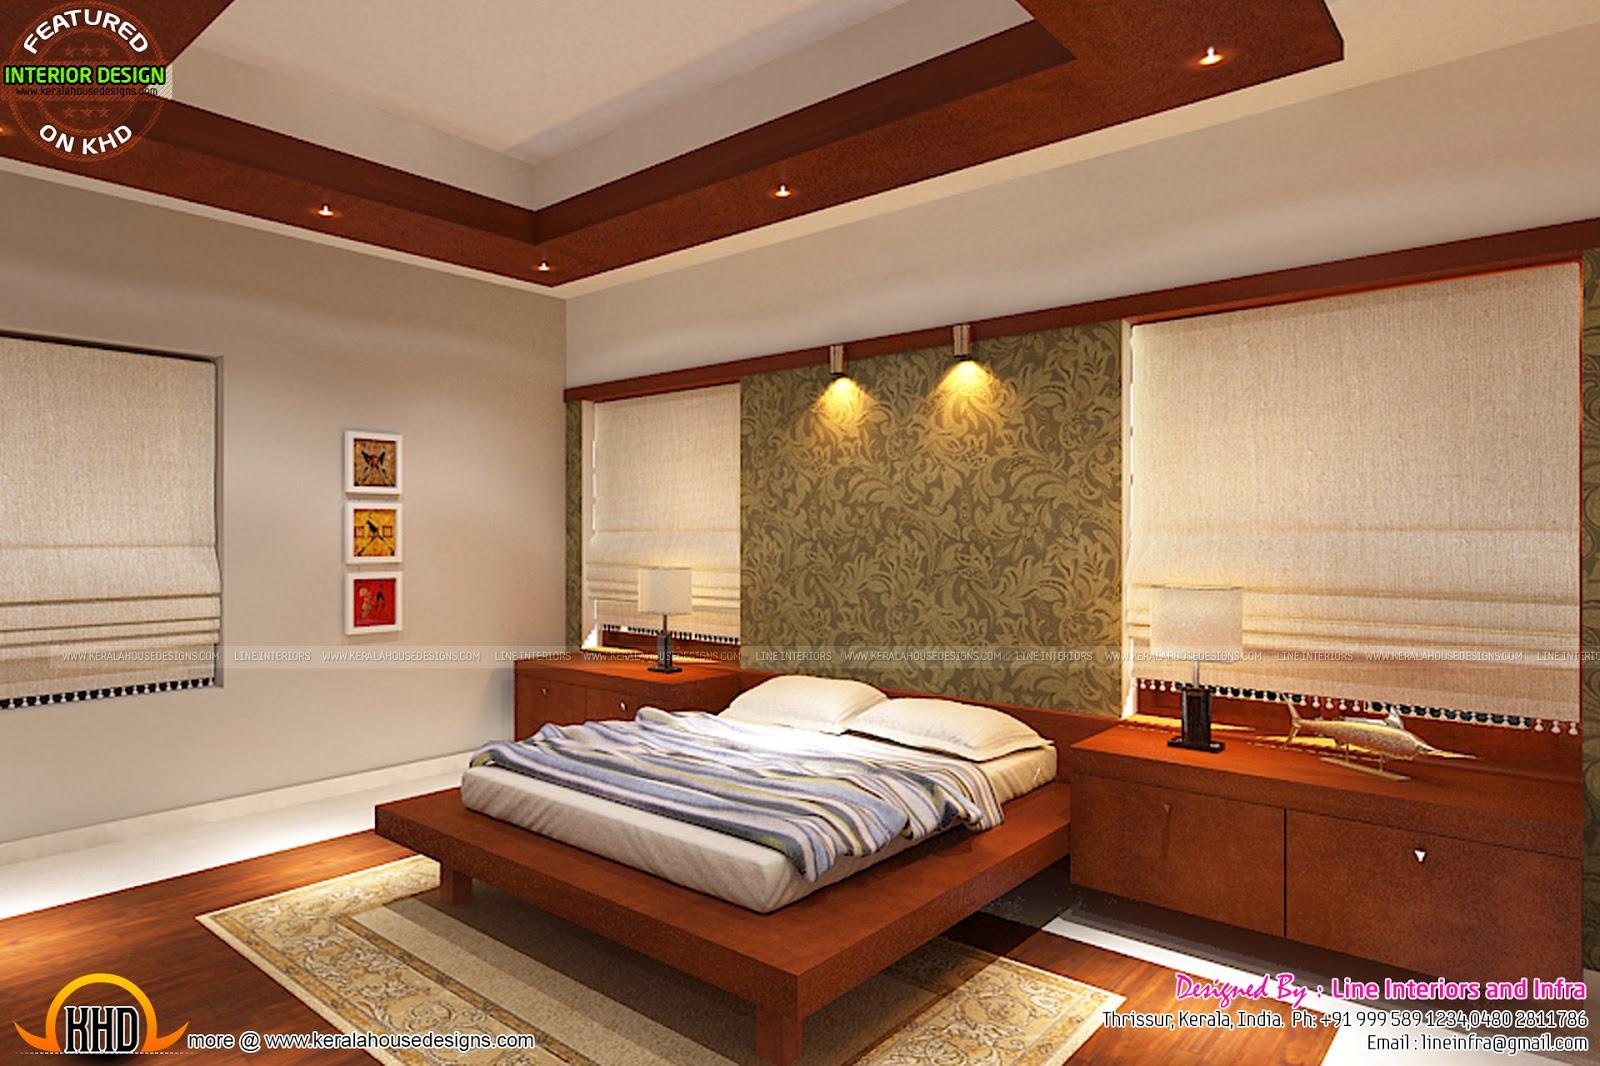 Kerala style bedroom interior designs for Kerala style interior design photos